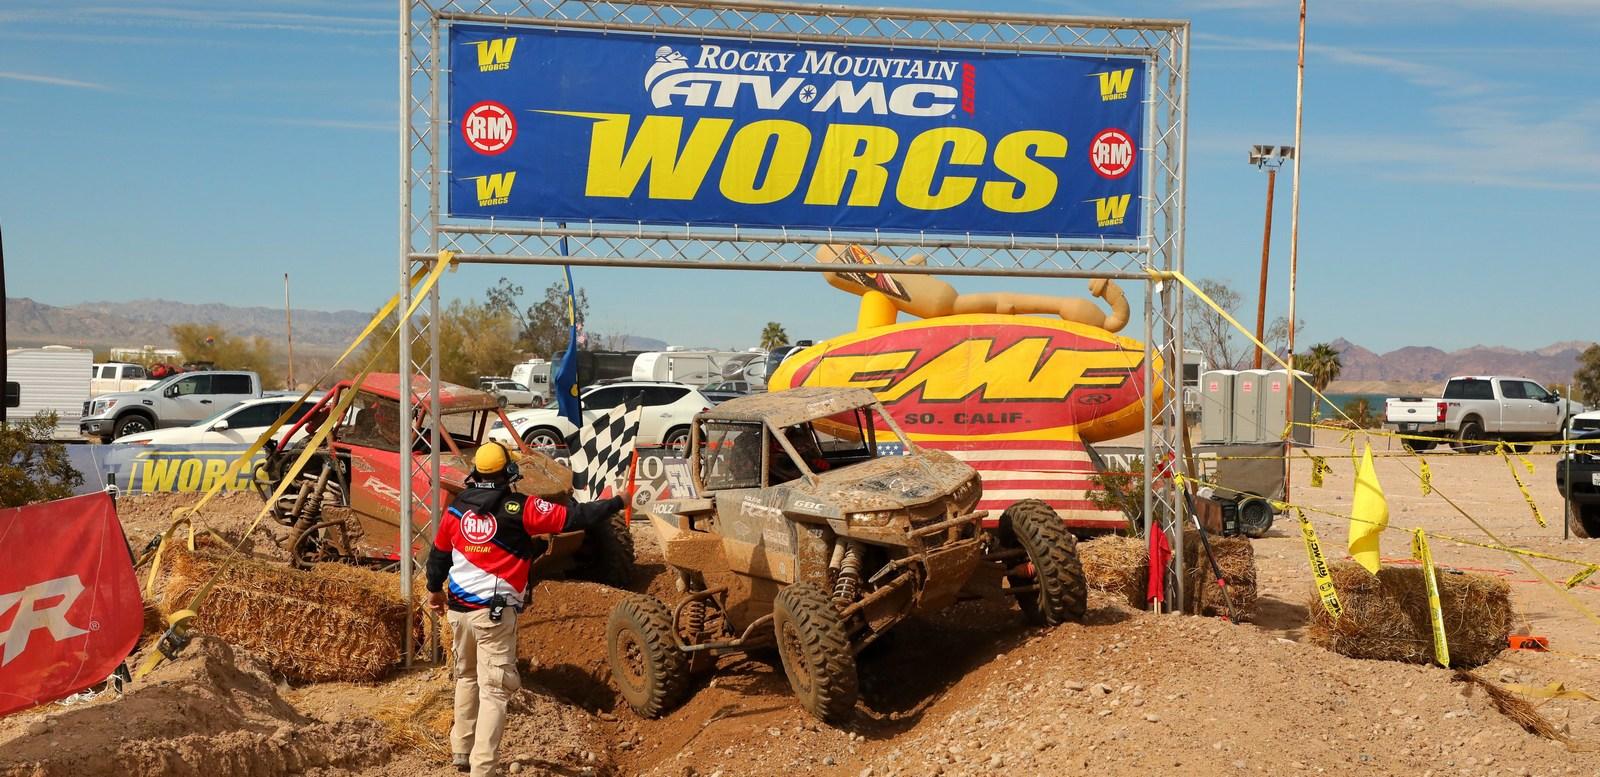 2019-02-corbin-leaverton-finish-sxs-worcs-racing